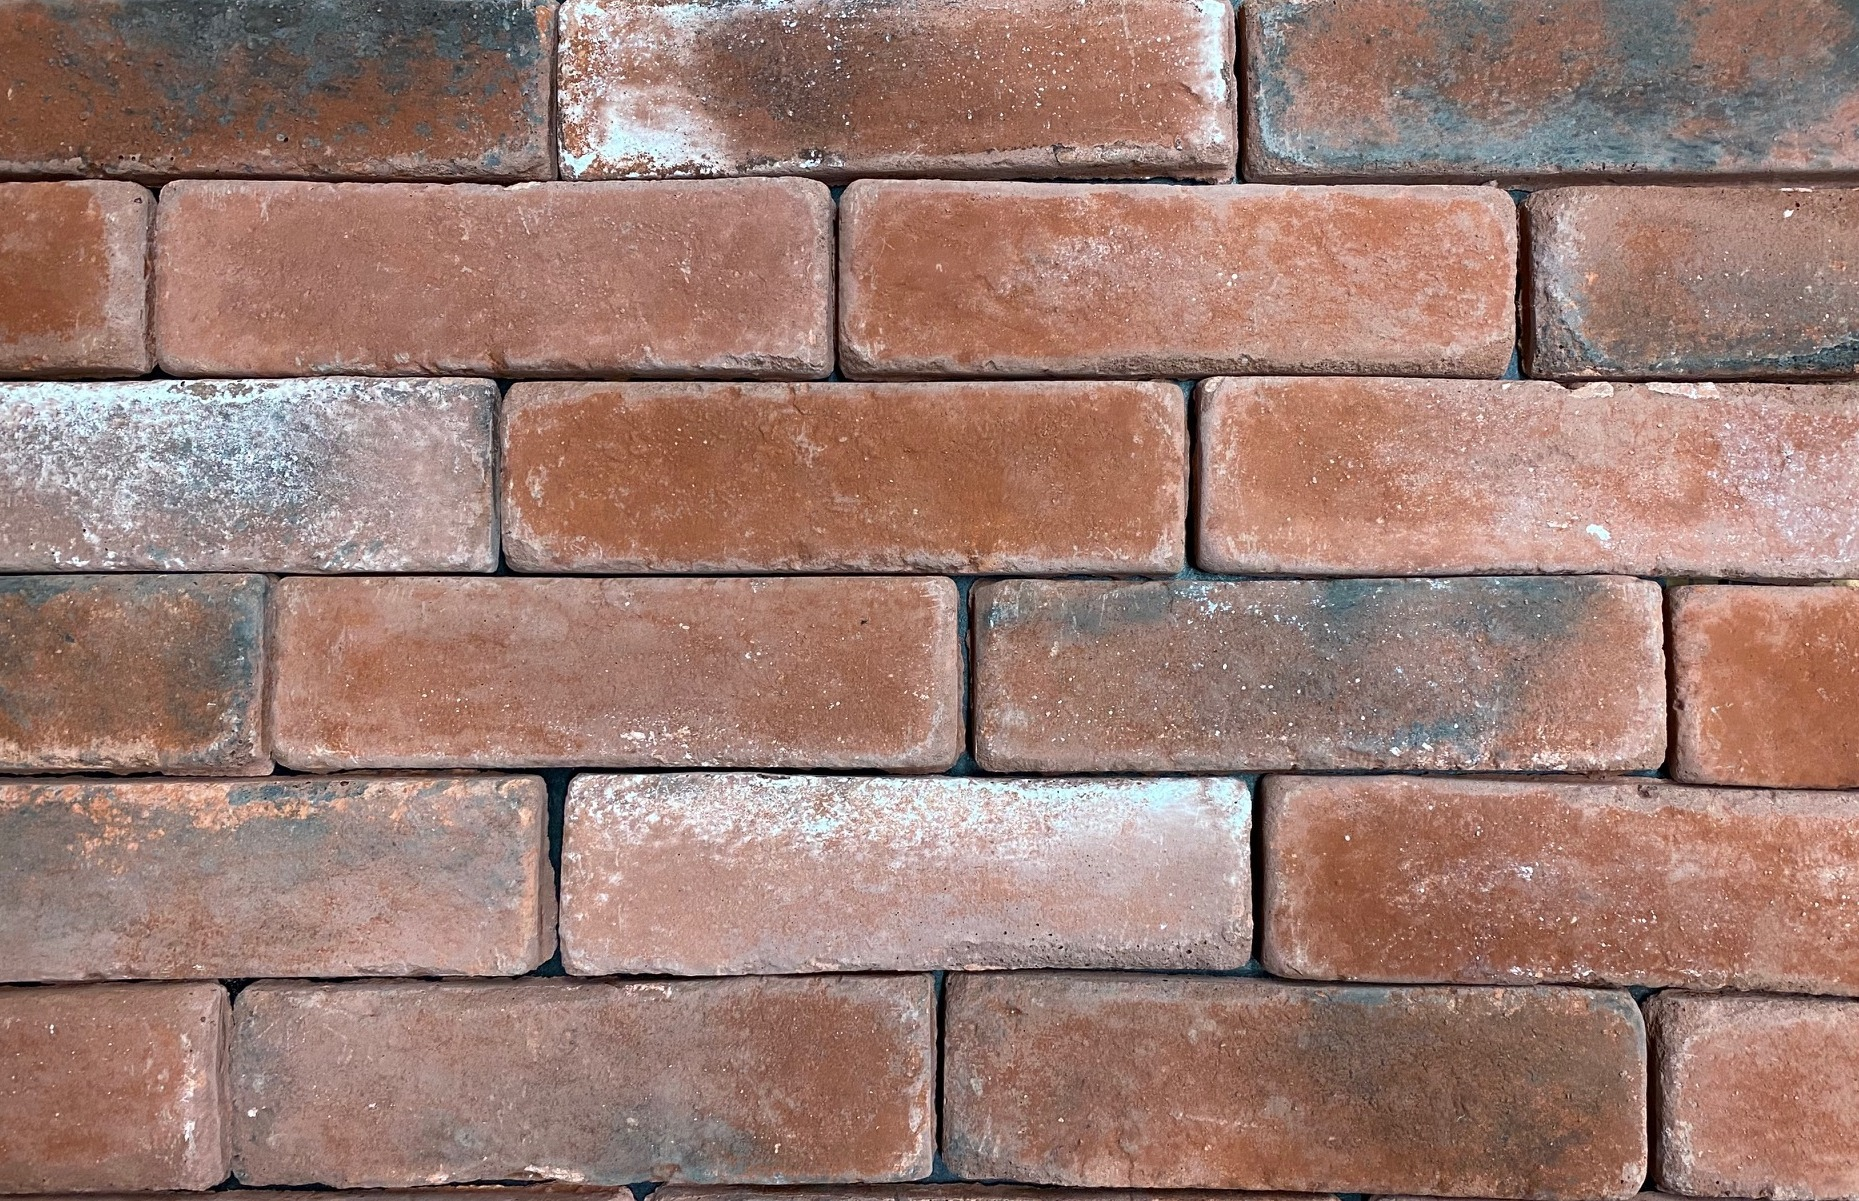 Patriot Pavers - Sadie's Vineyard brick color